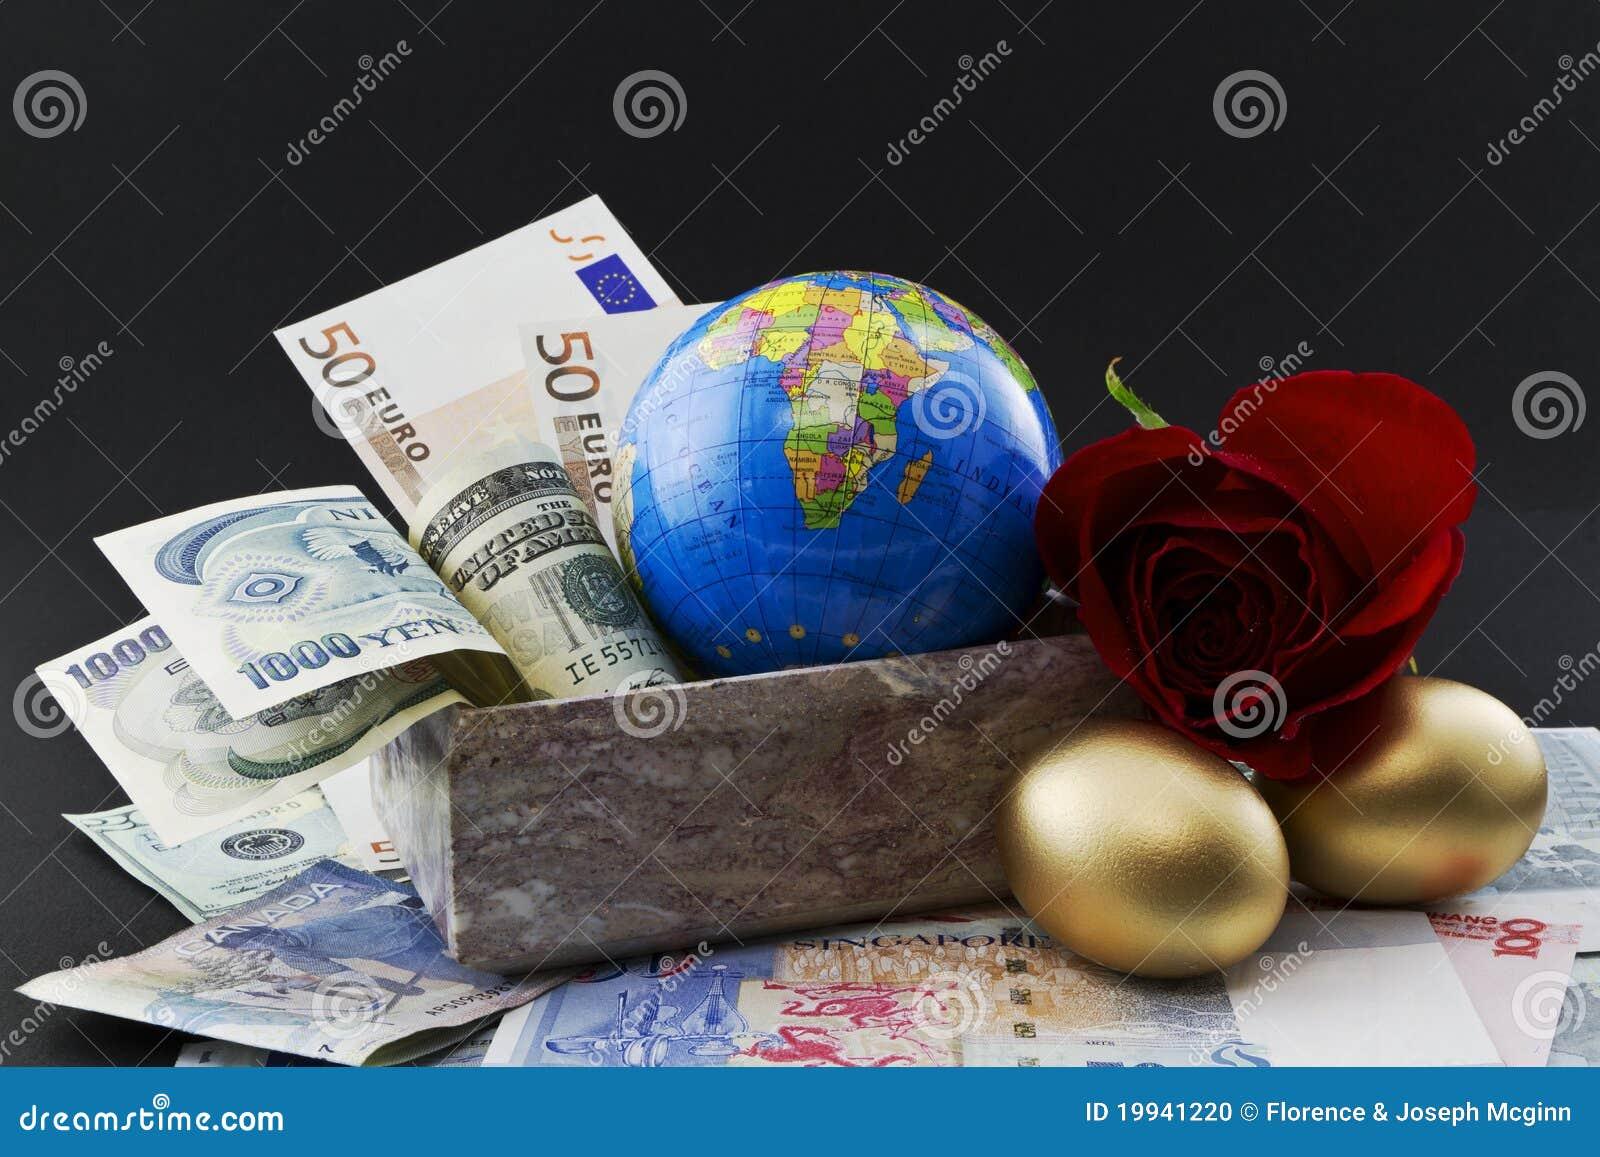 Vertikal diversification of investments warren buffett forex trading